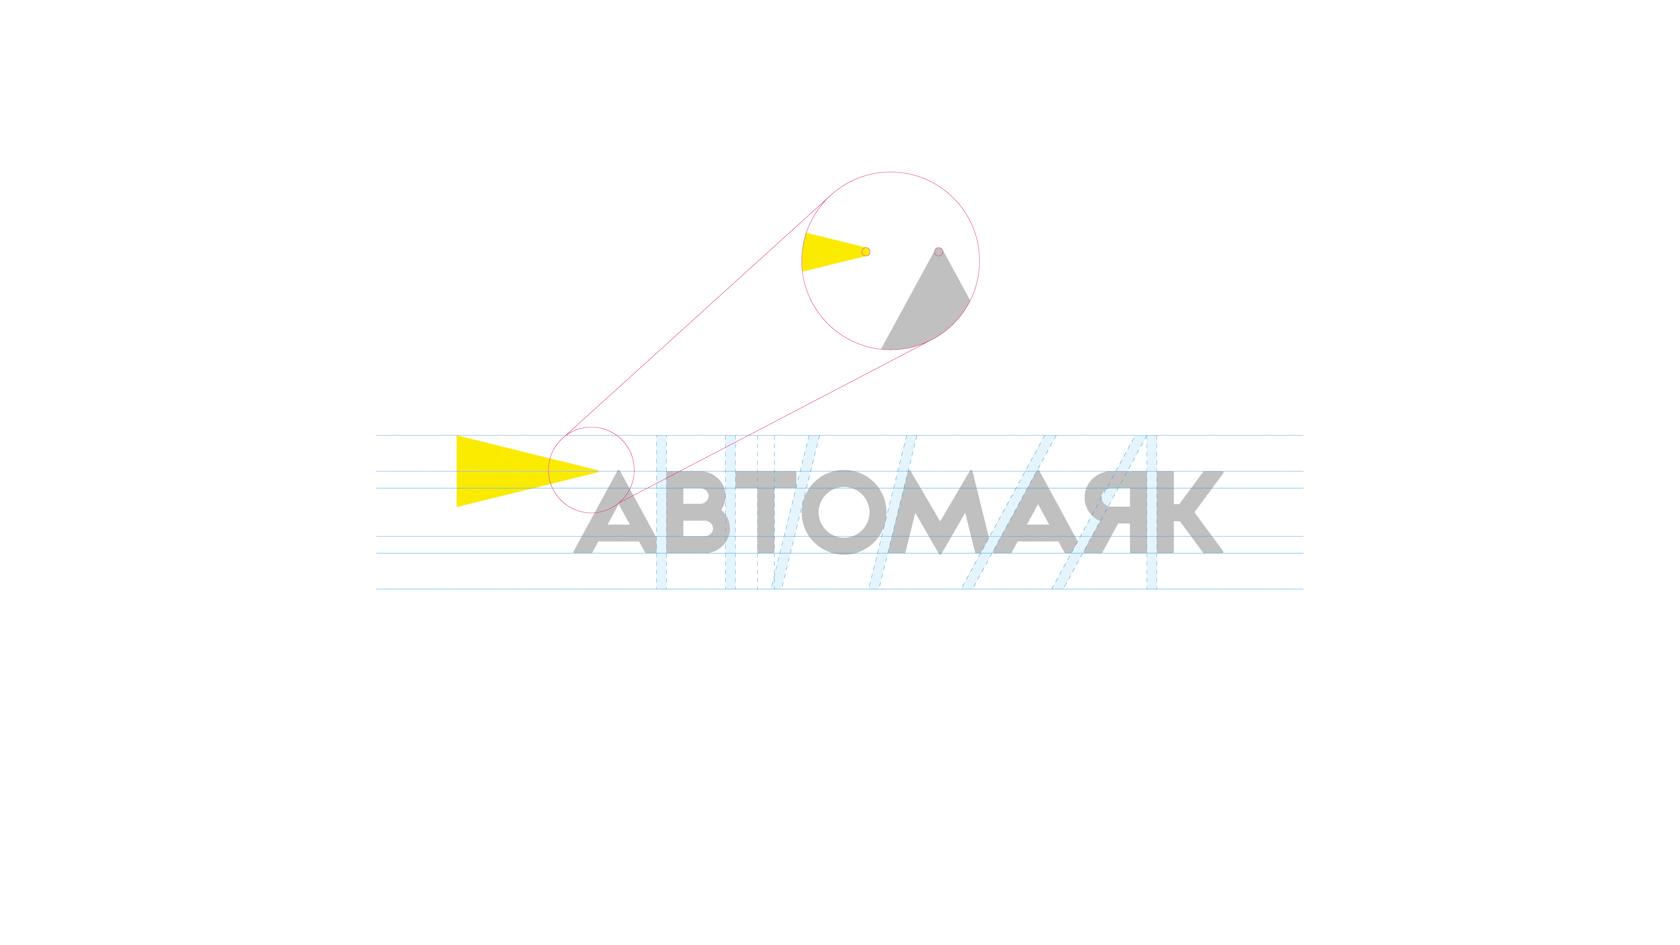 Логотип Автомаяк, разработка логотипа